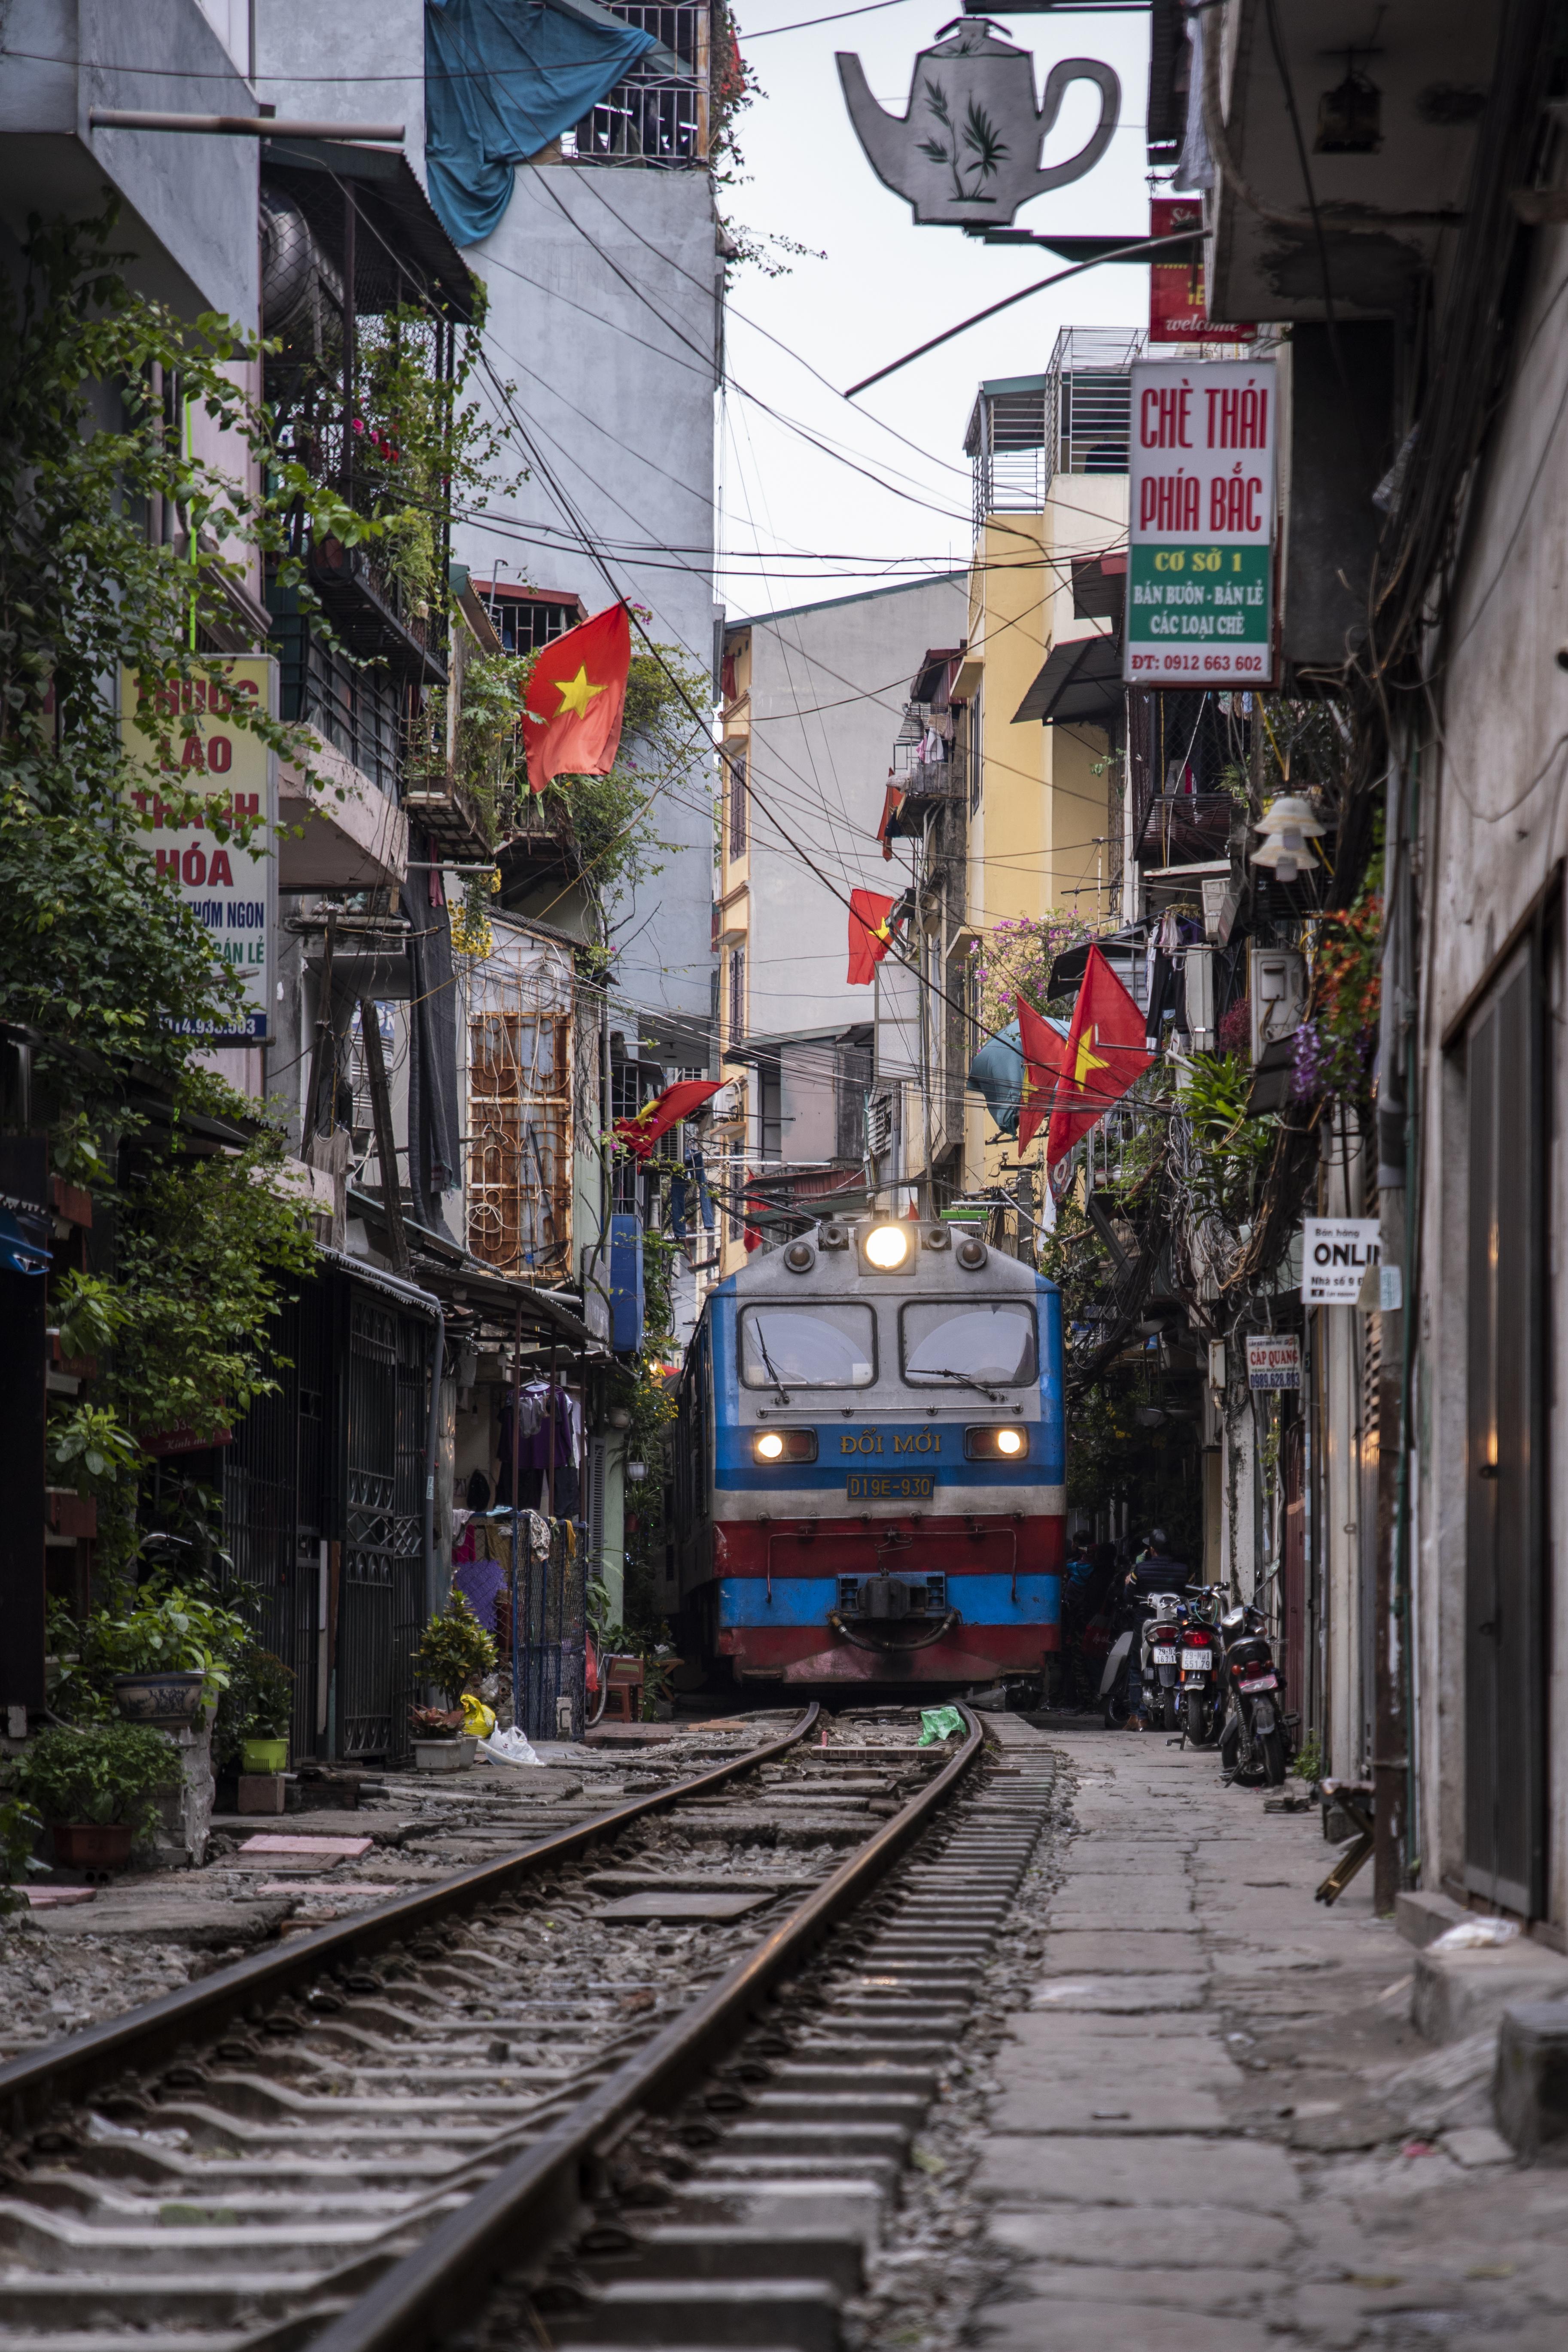 Train on a narrow street